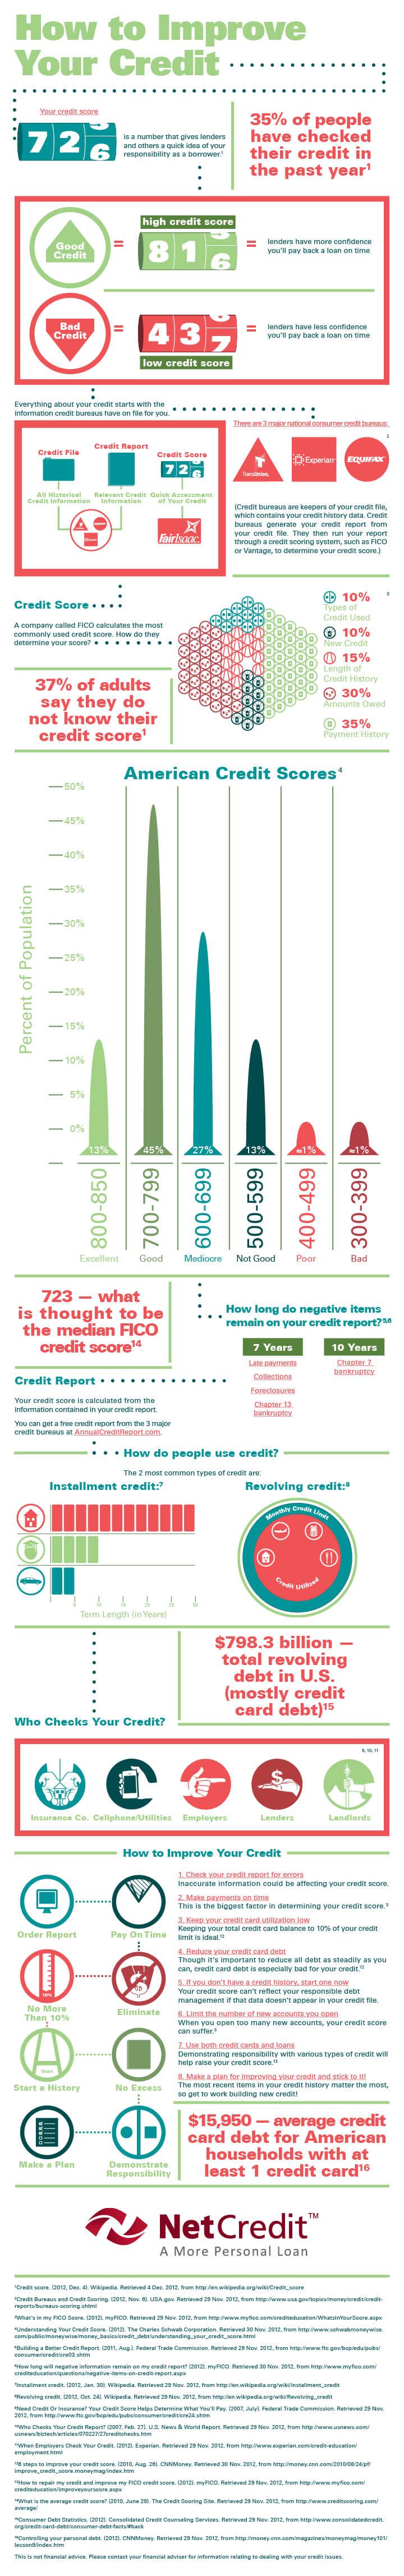 NC_ImprovingCredit_Infographic_Entire_CM_2-4-13